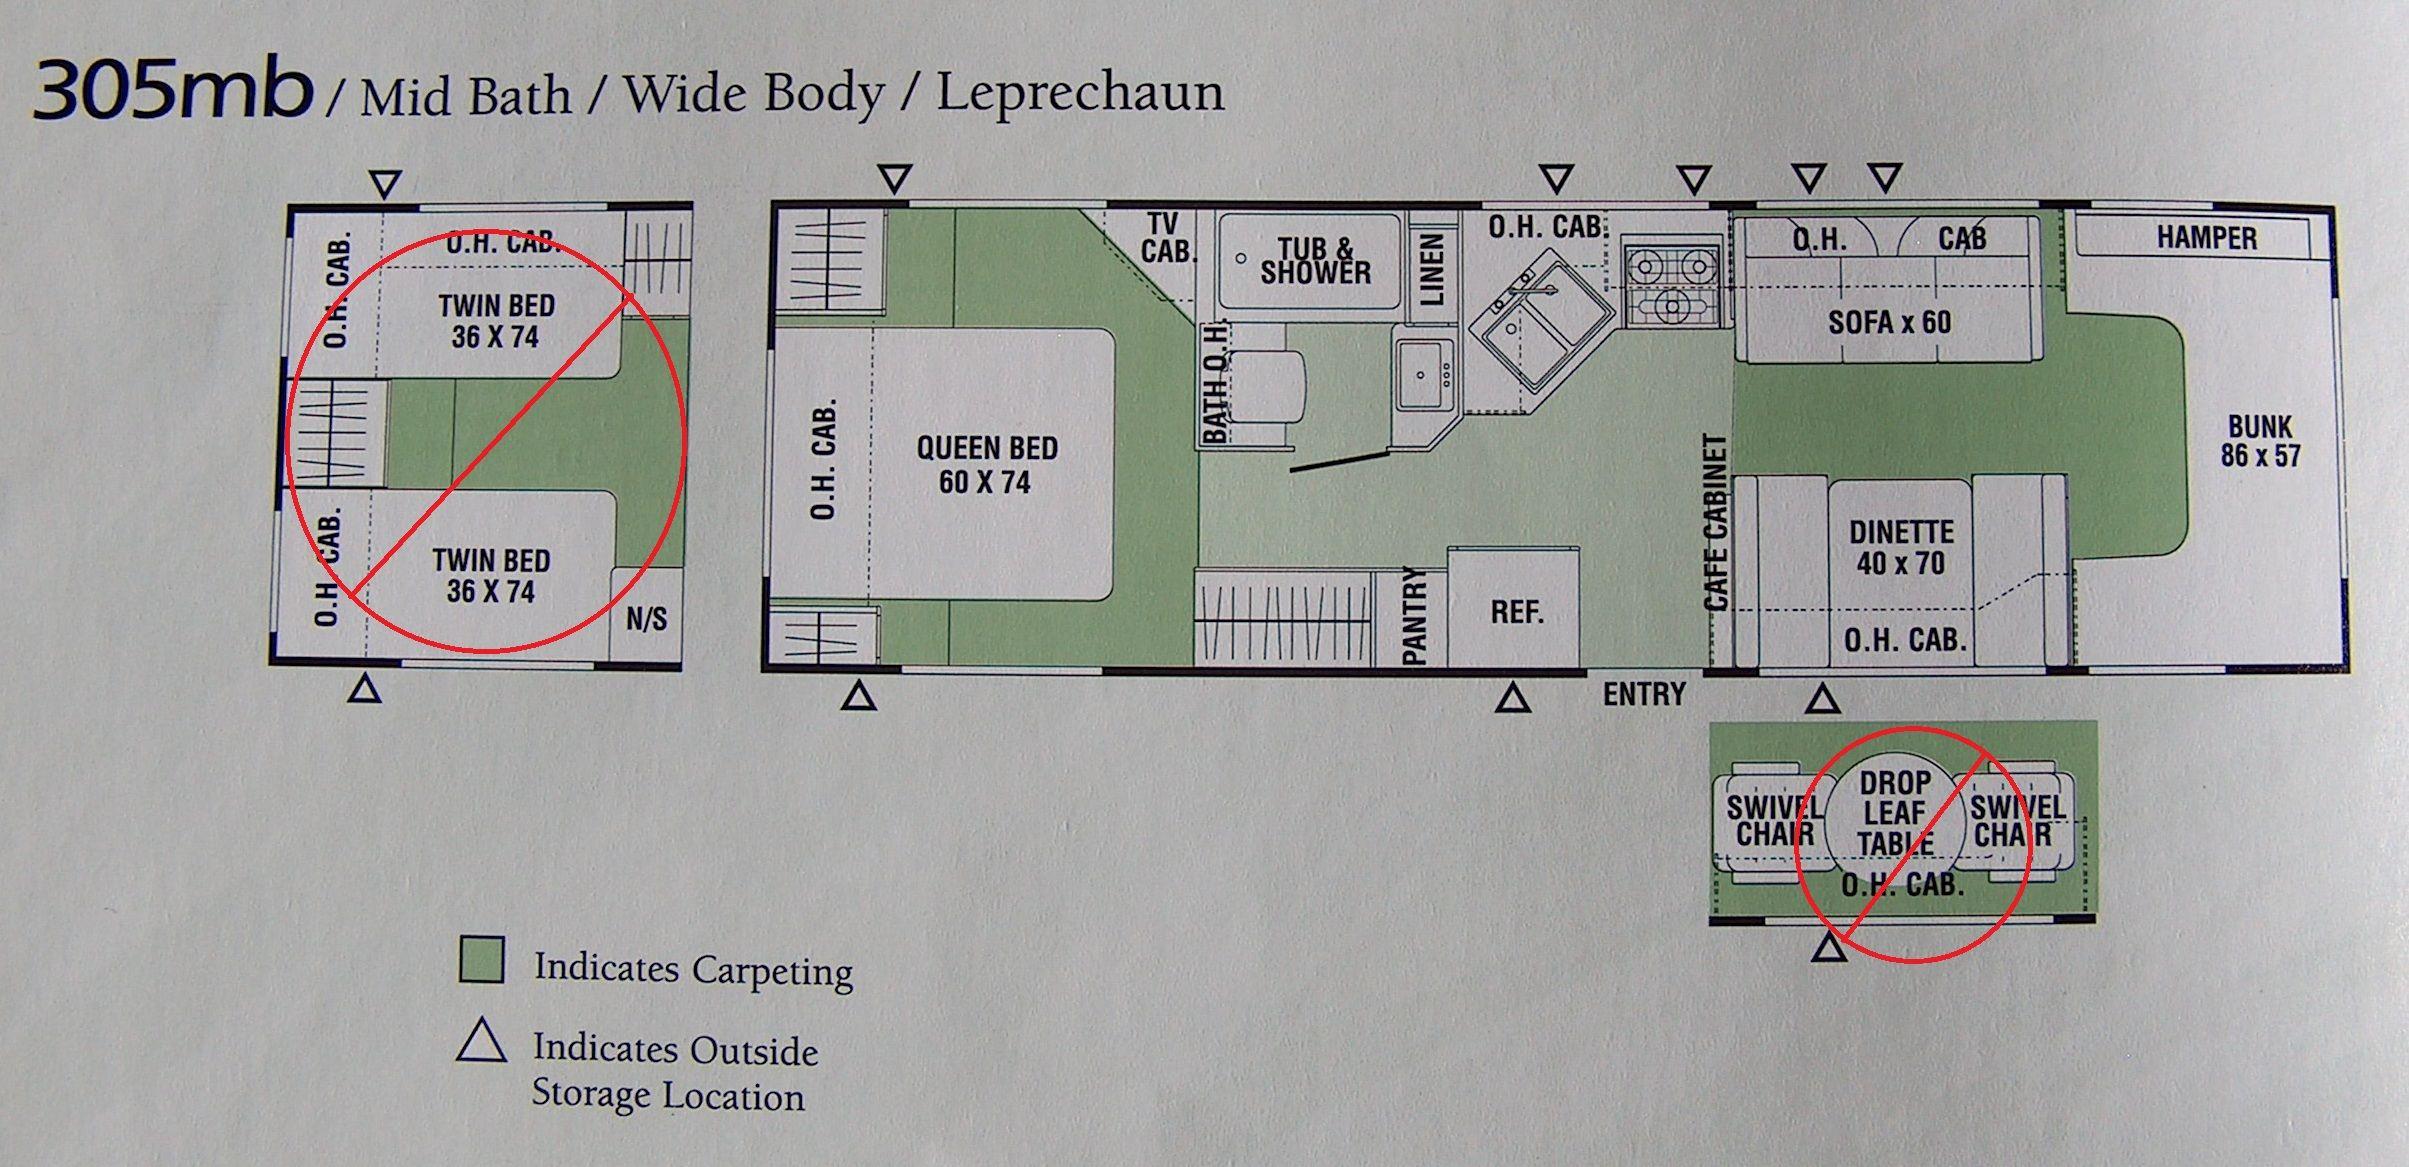 305mb Coachmen Leprechaun floor plan - huge closet | RV | Pinterest ...